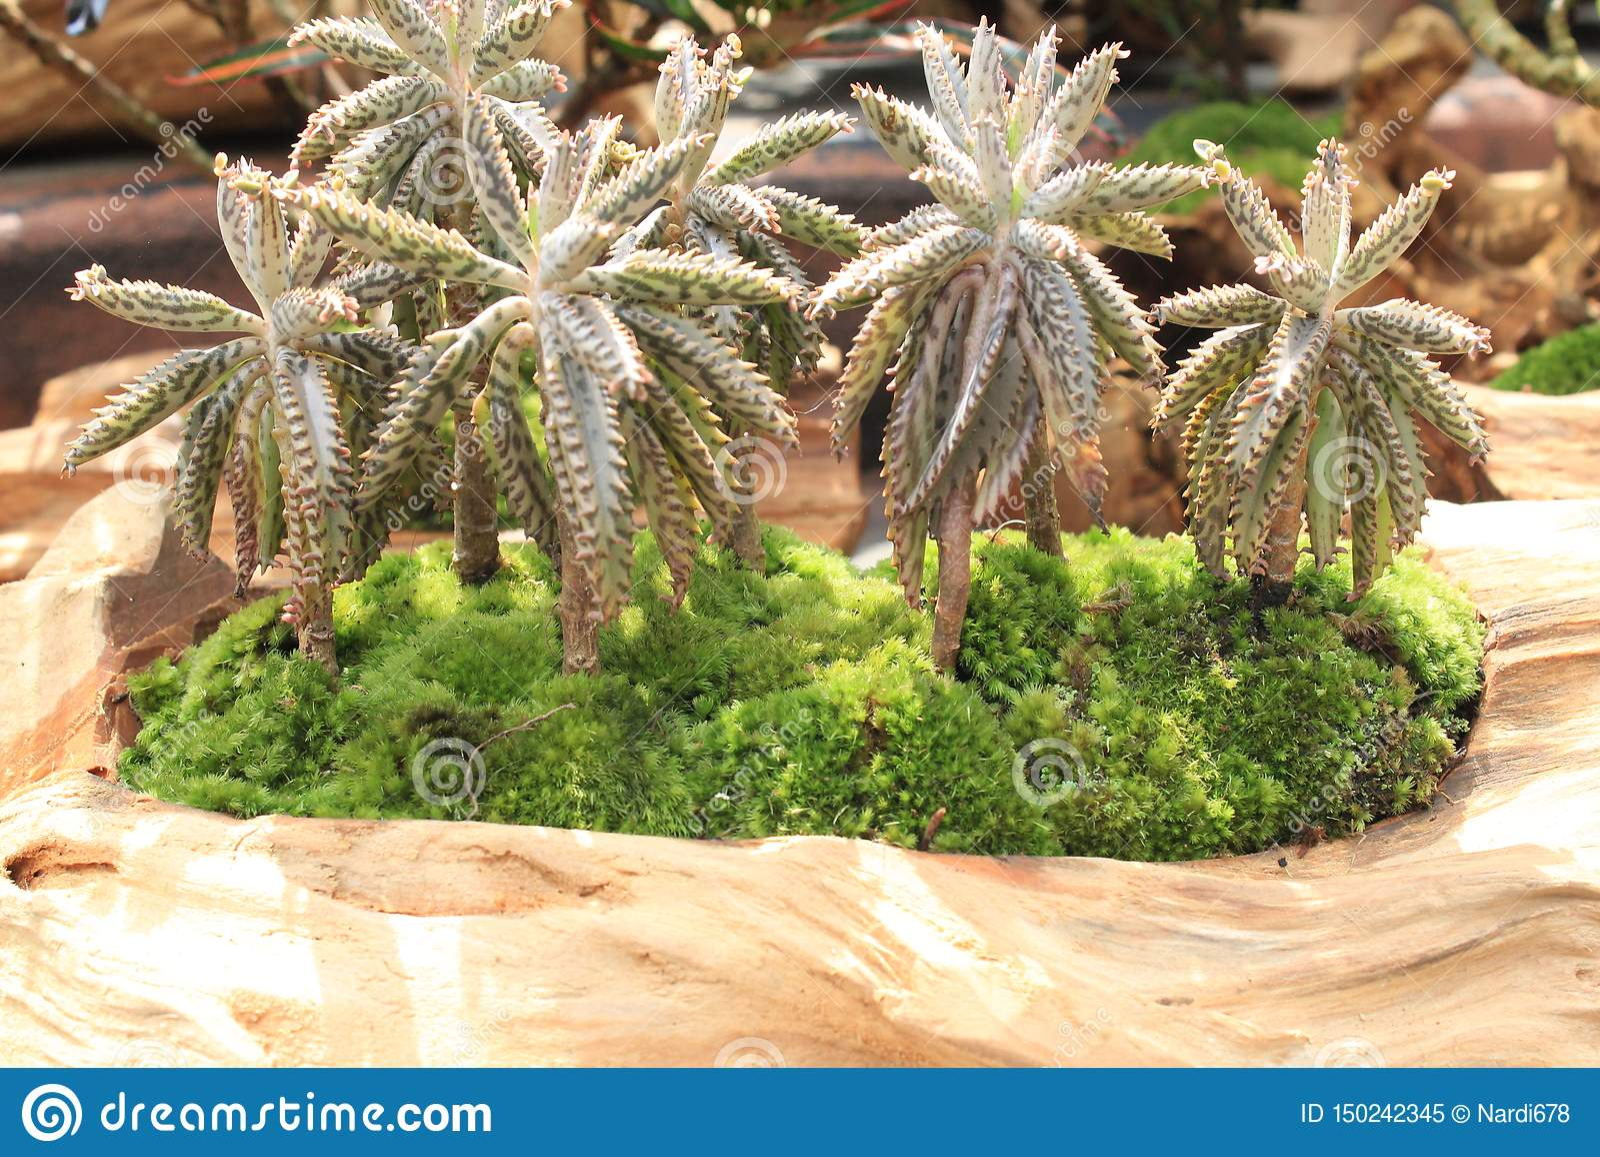 Grupo de árvore de coco minúscula